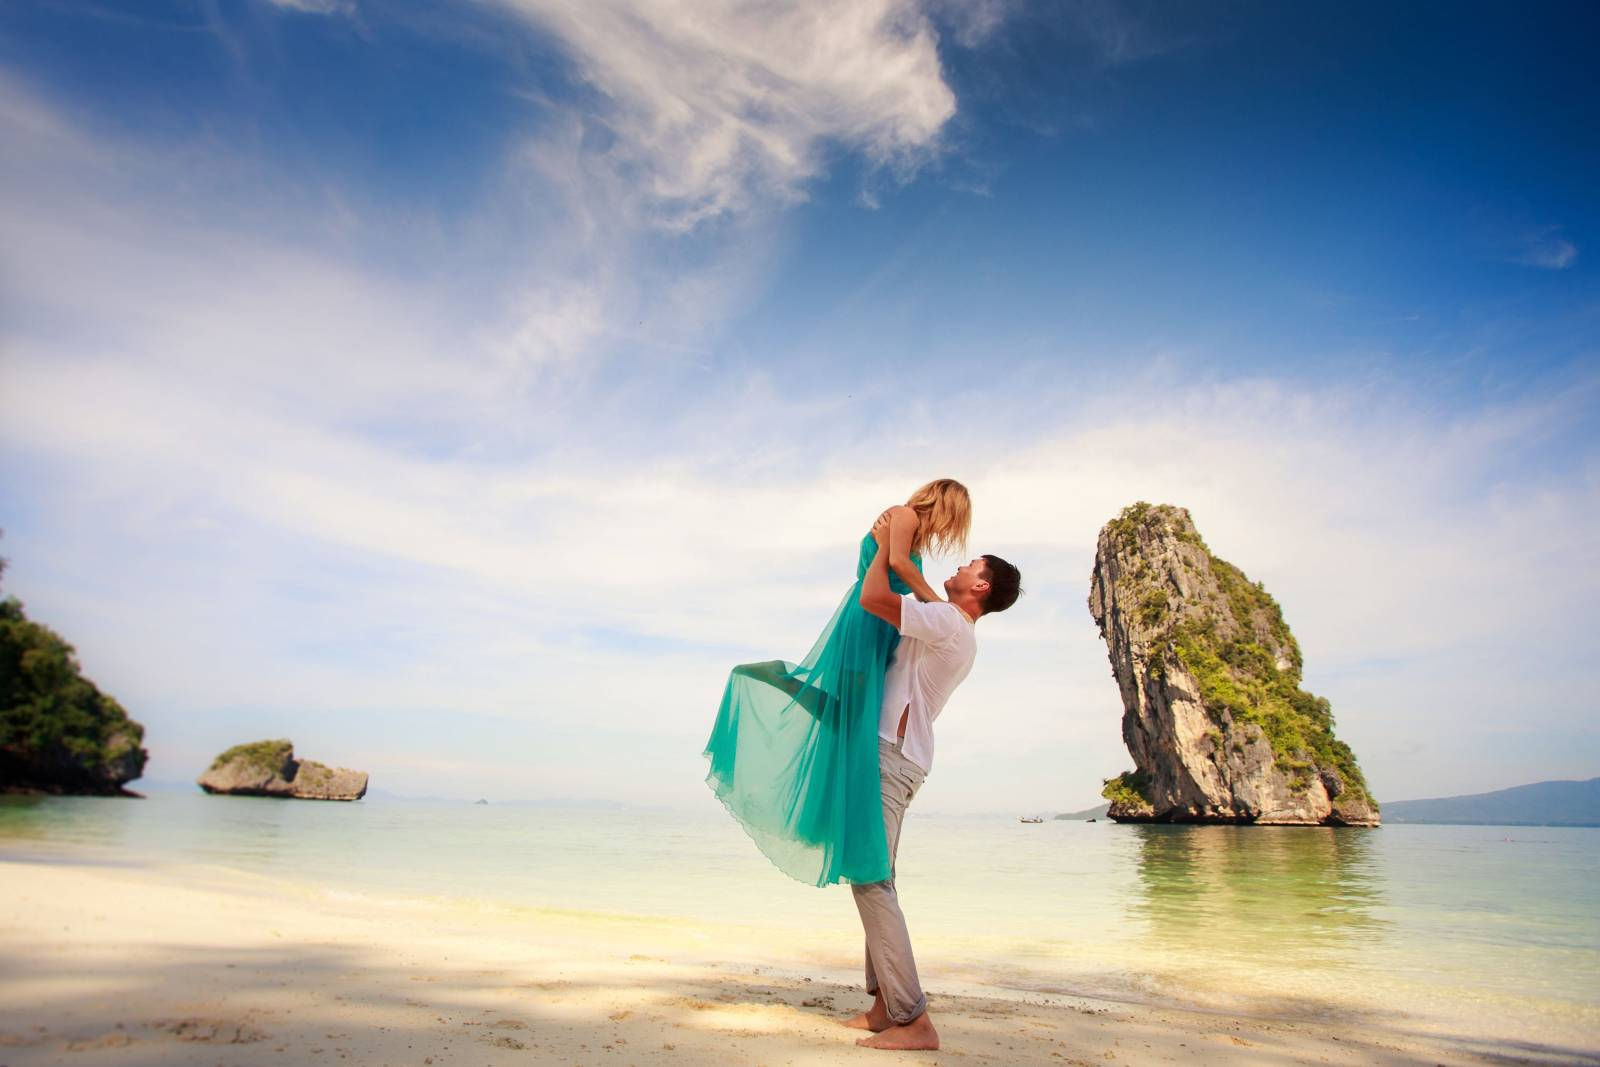 Travel-Zone - Huwelijksreis - House of Weddings - 2